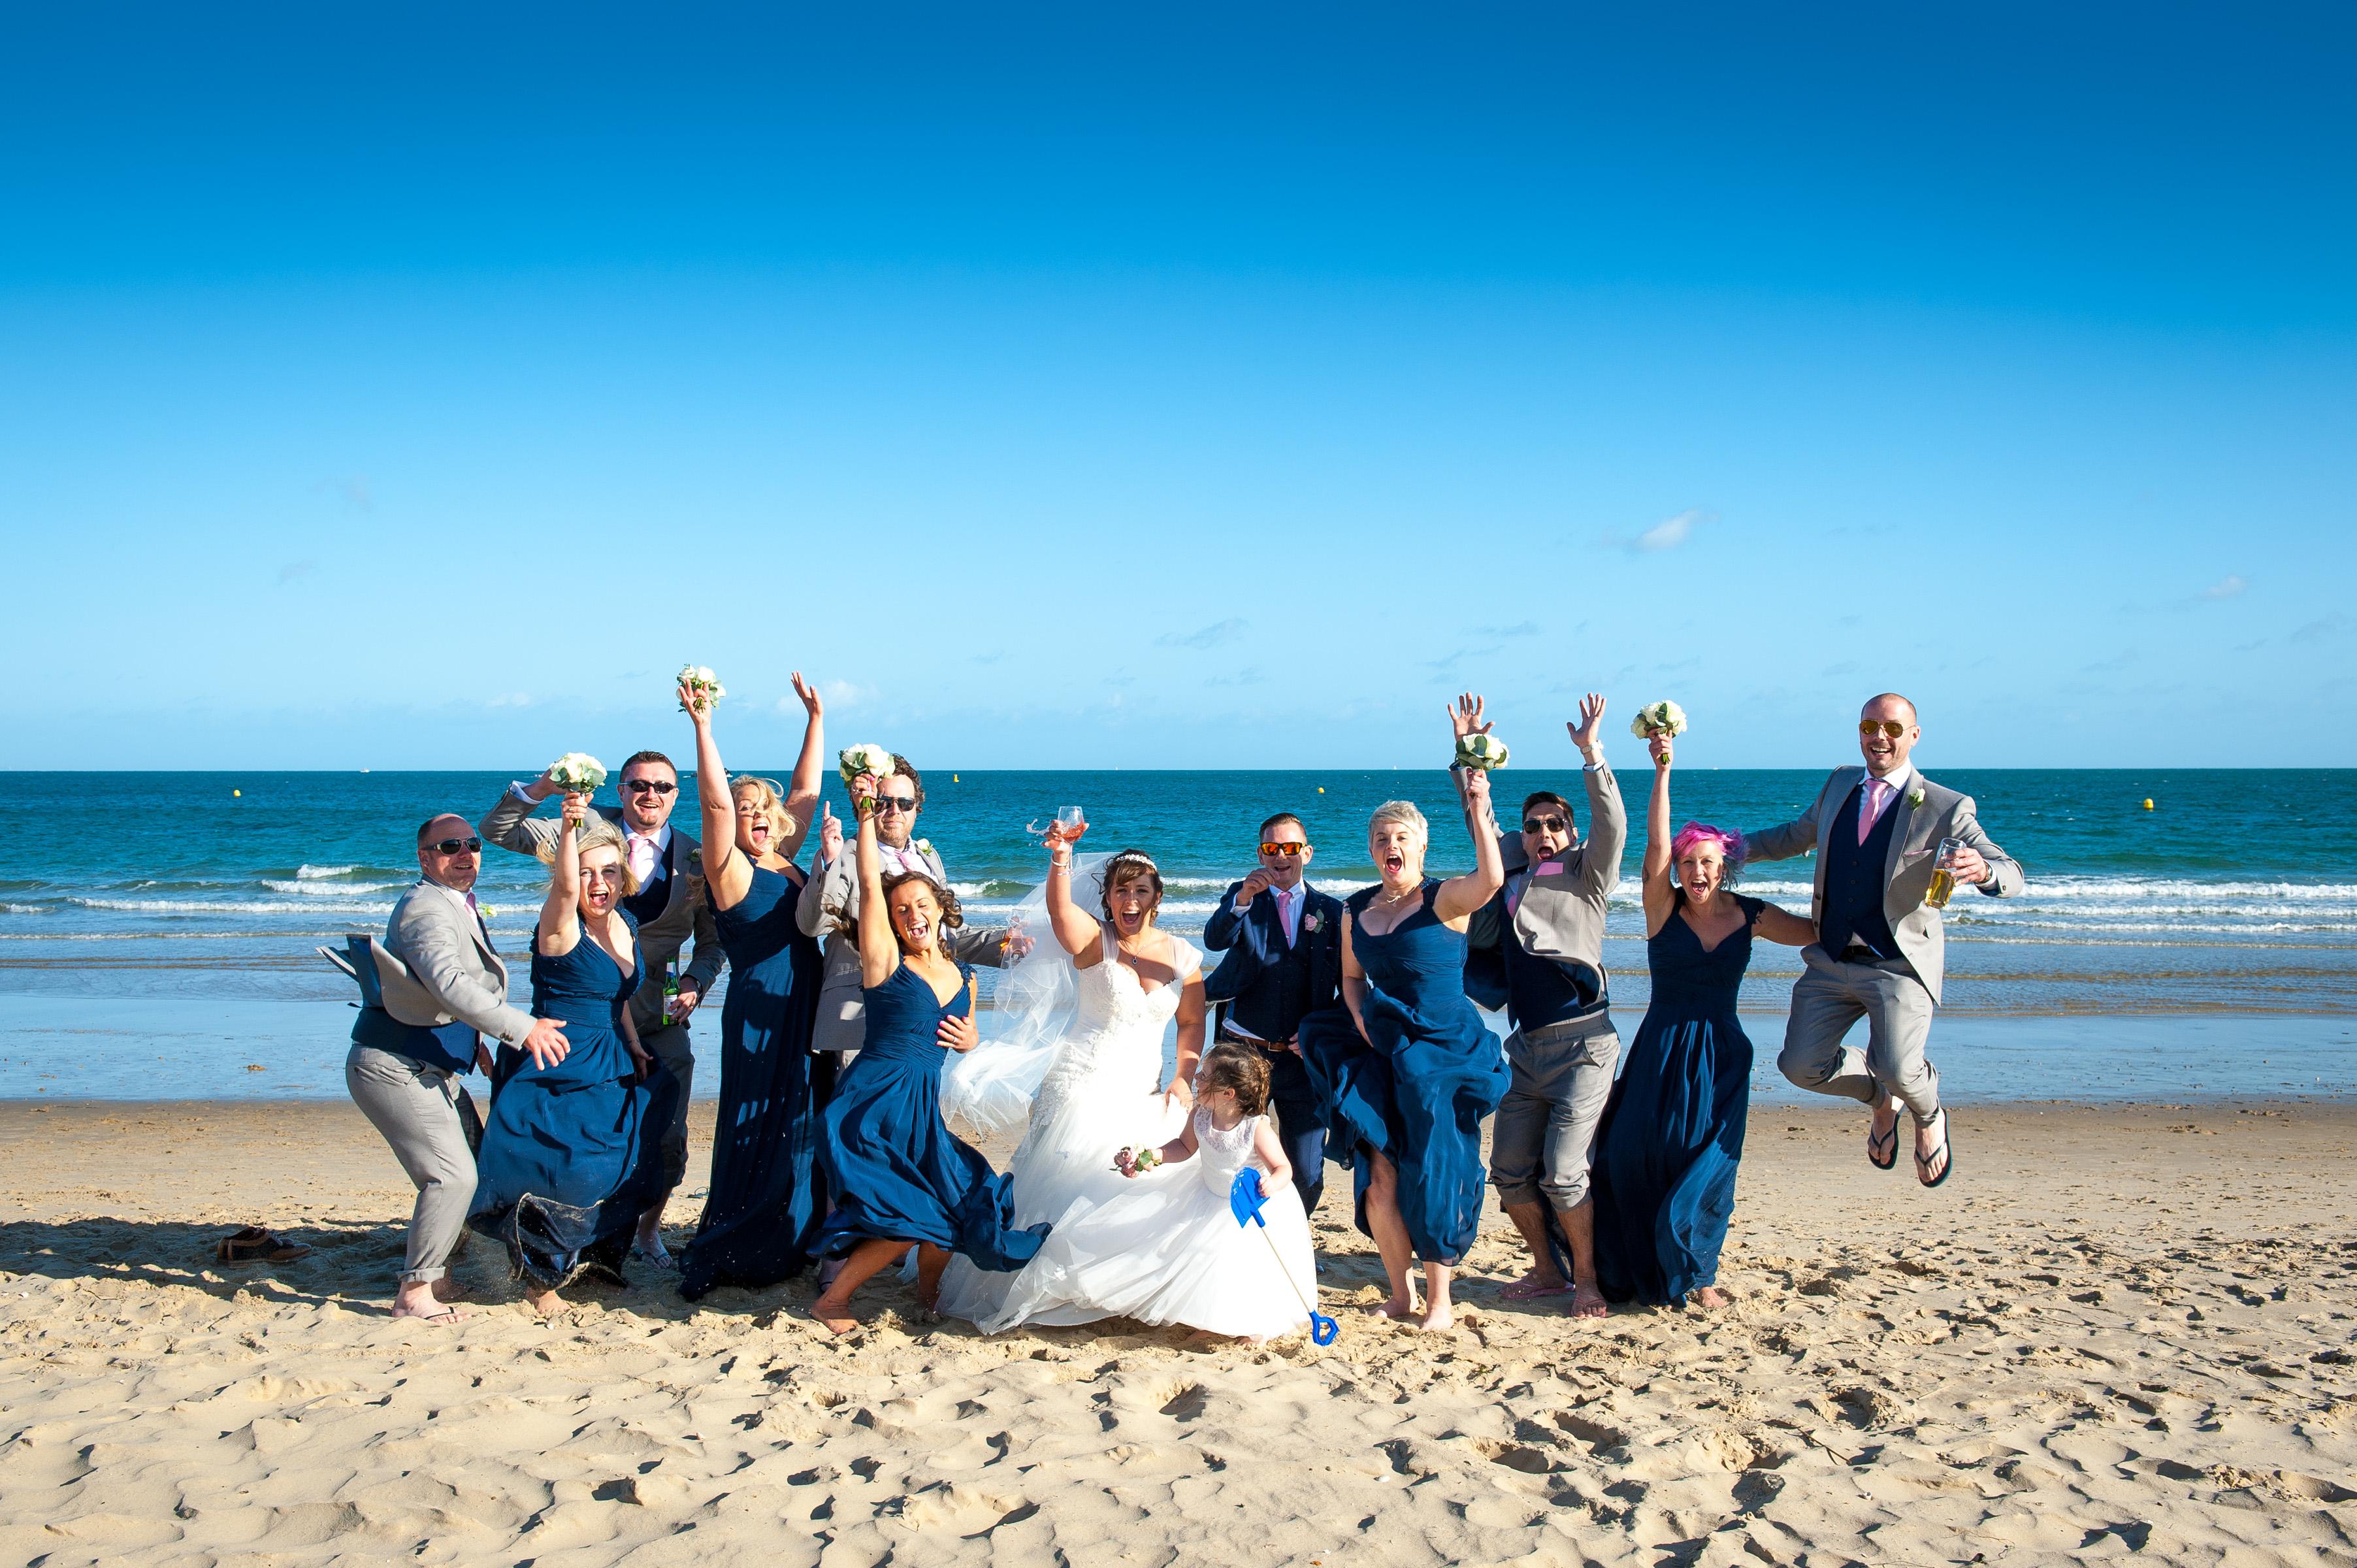 image of sandbanks wedding